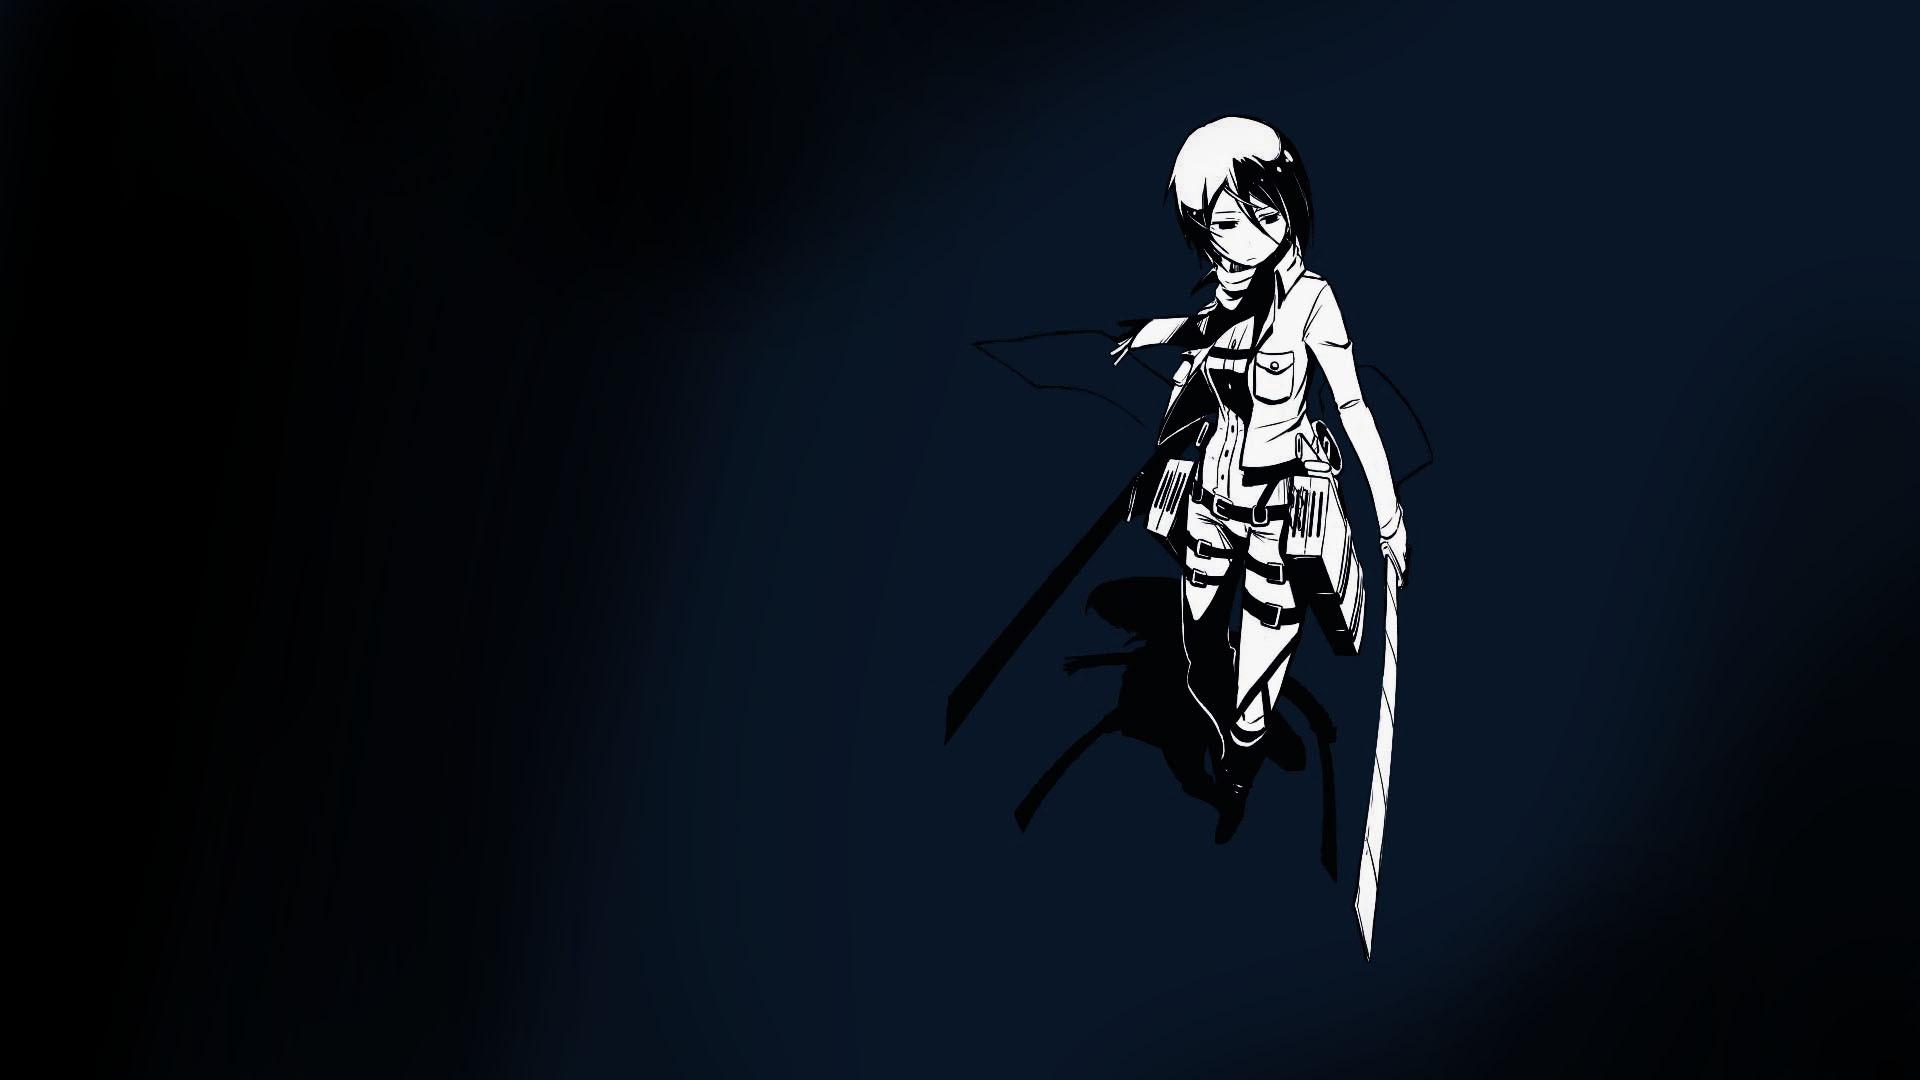 Attack on Titan wallpaper 11